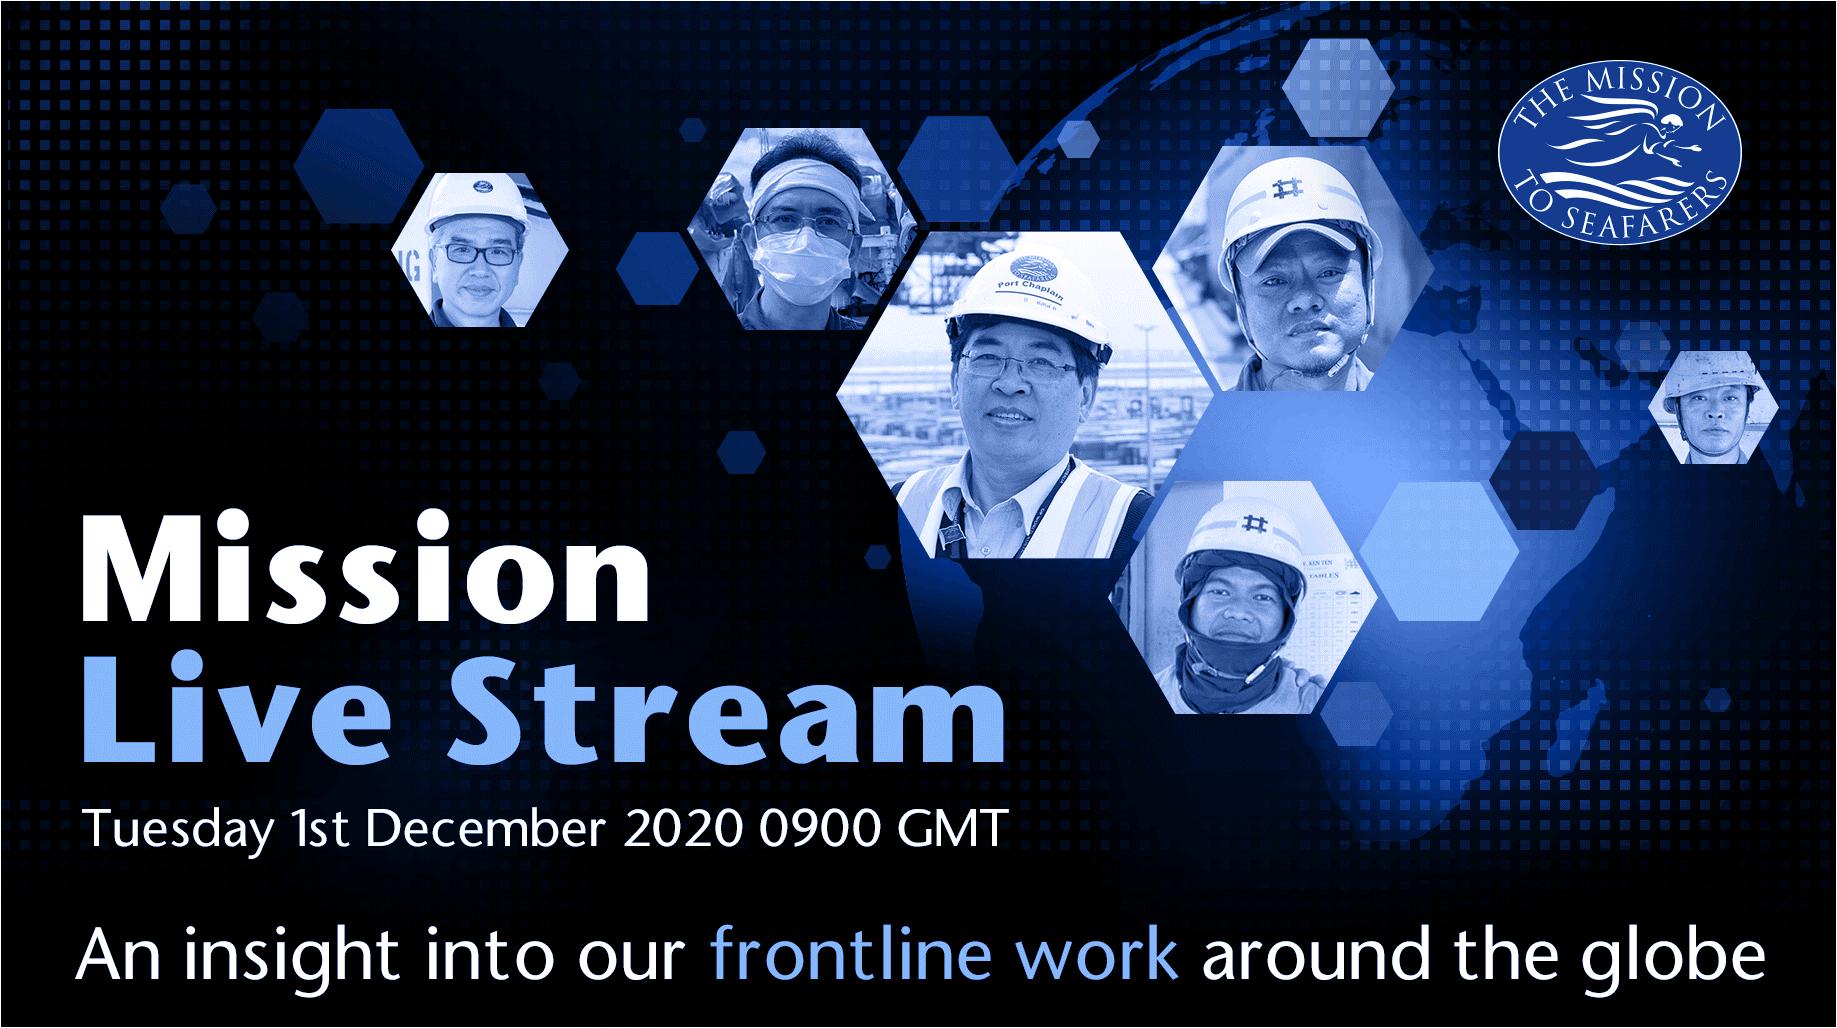 Mission Live Stream